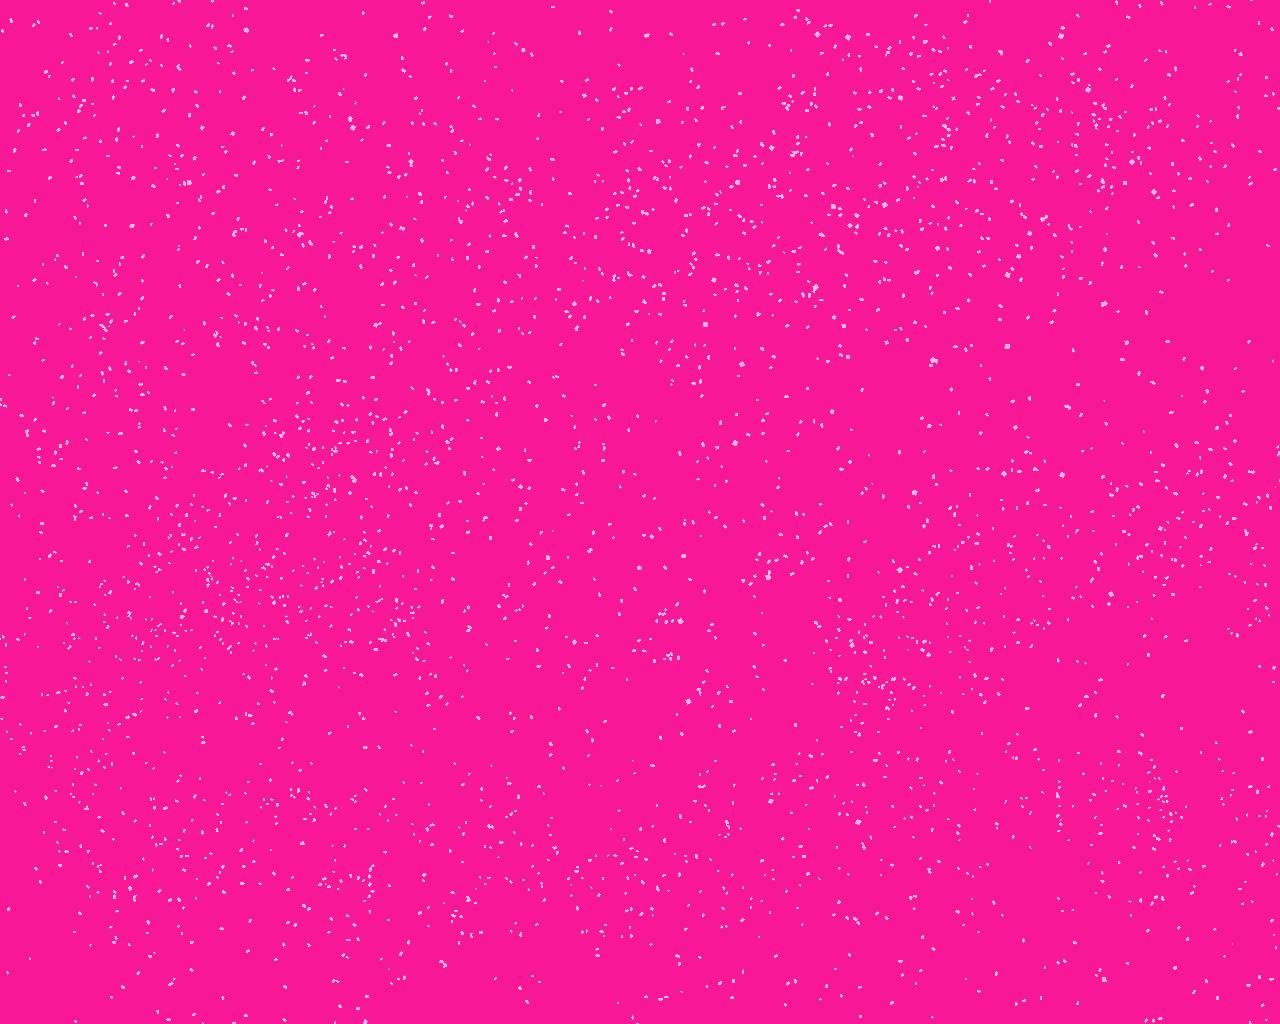 glitter wallpaper hd wallpaper desktop beautiful wallpapers hd 1280x1024